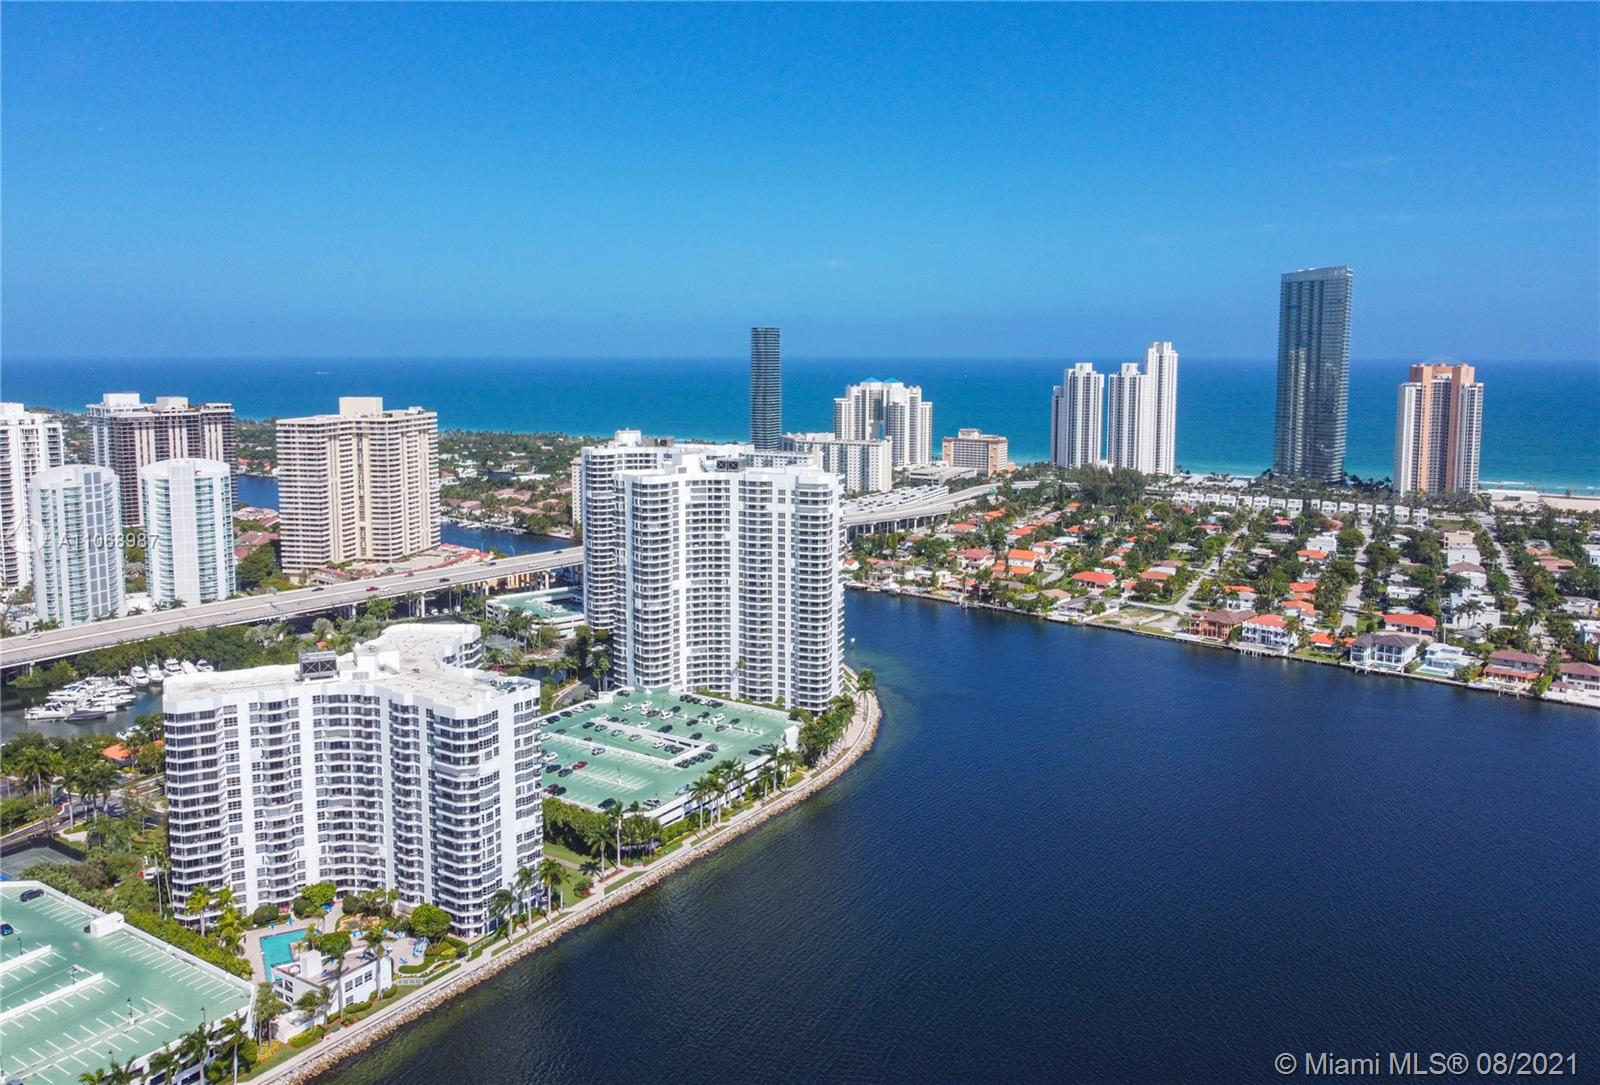 Mystic Pointe Tower 300 #1210 - 3600 Mystic Pointe Dr #1210, Aventura, FL 33180